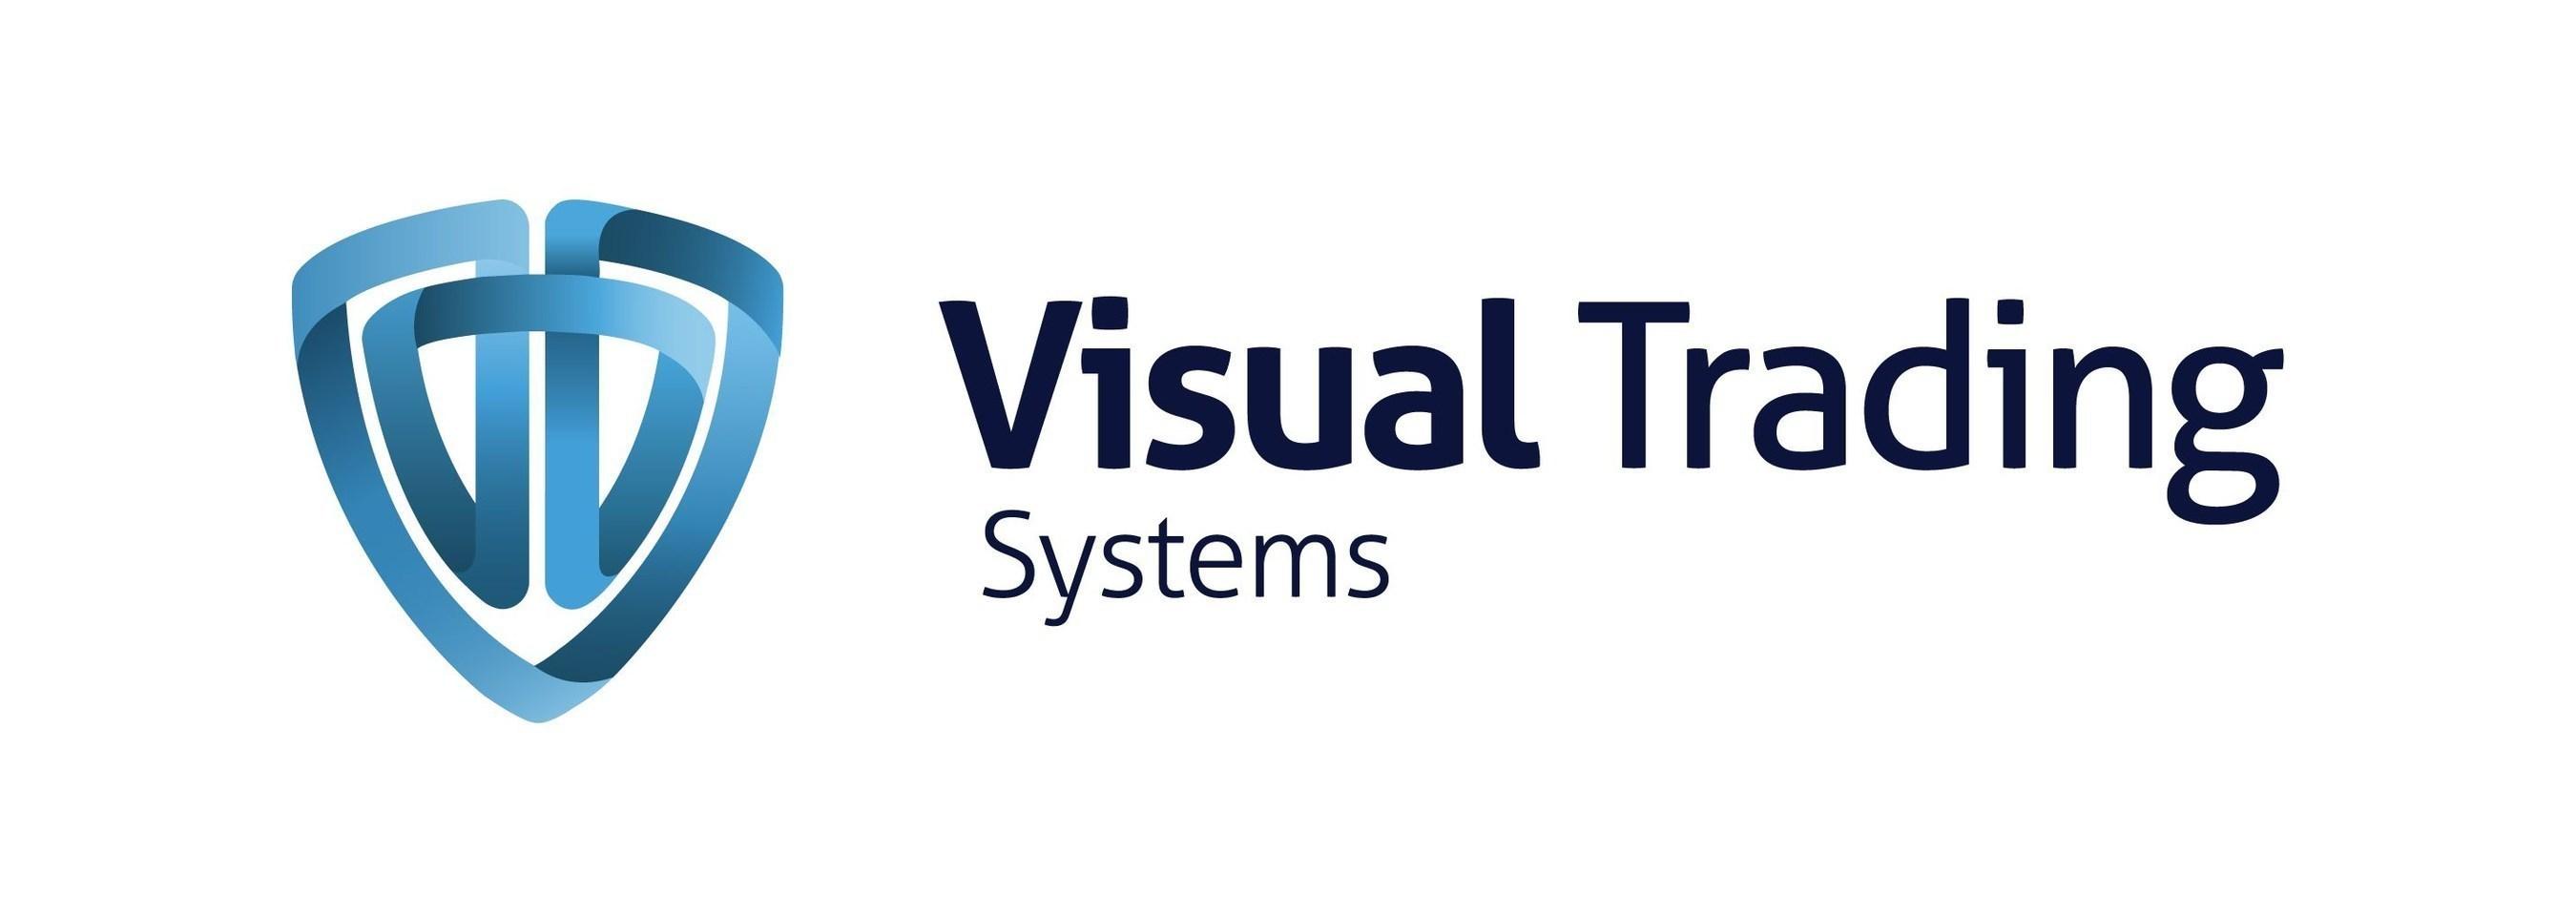 Visual Trading Systems (PRNewsFoto/Visual Trading Systems)